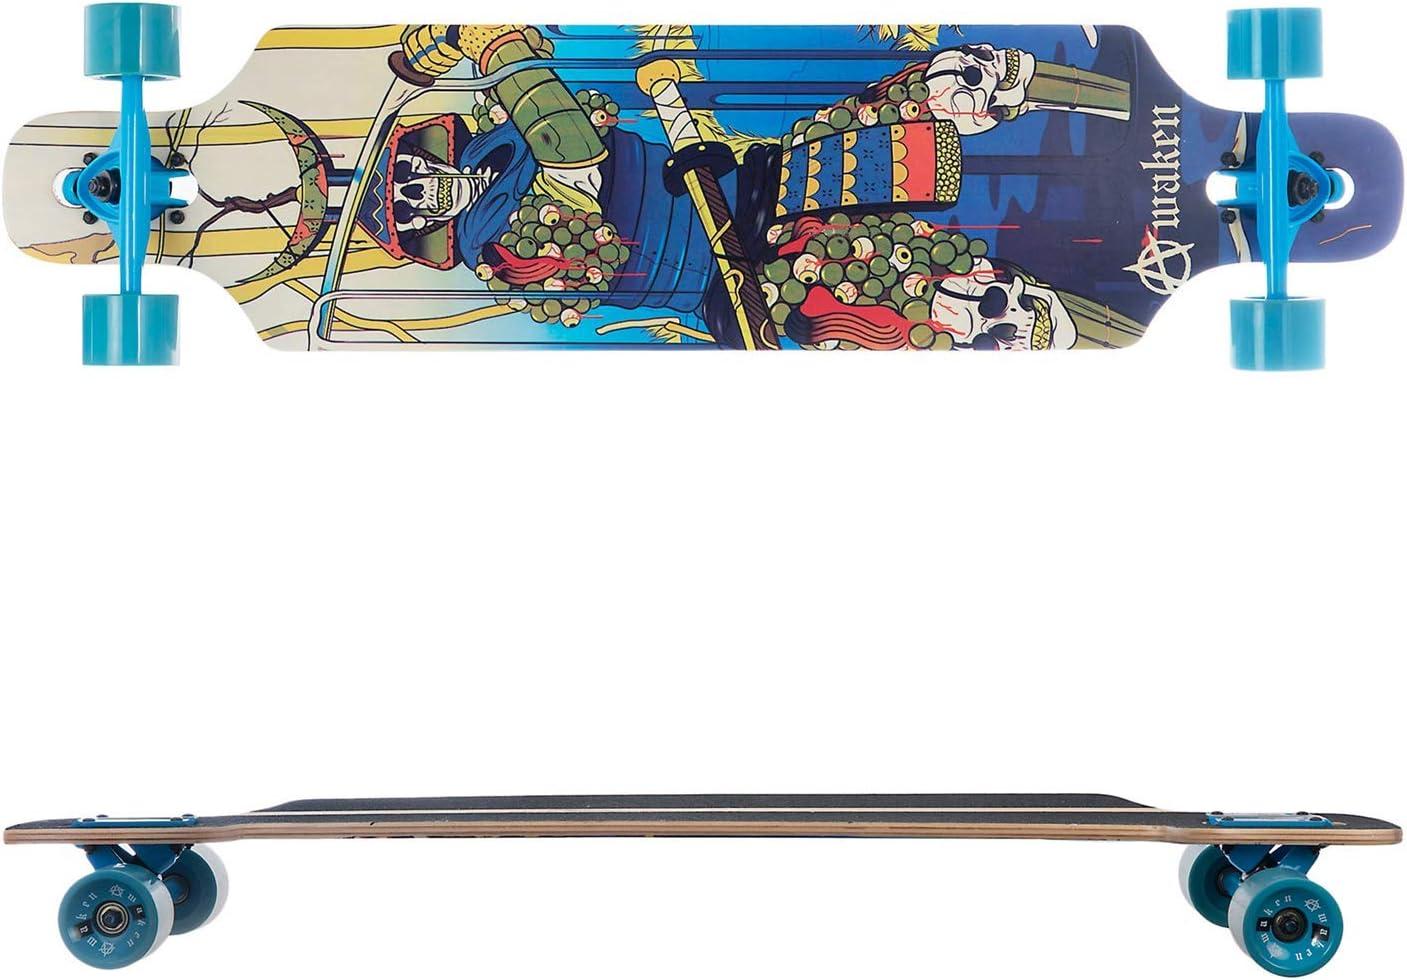 monopat/ín 40 Pulgadas de Patinaje Longboard Skateboard Completo para Carving Downhill Cruising Freestyle Riding para ni/ños Adultos